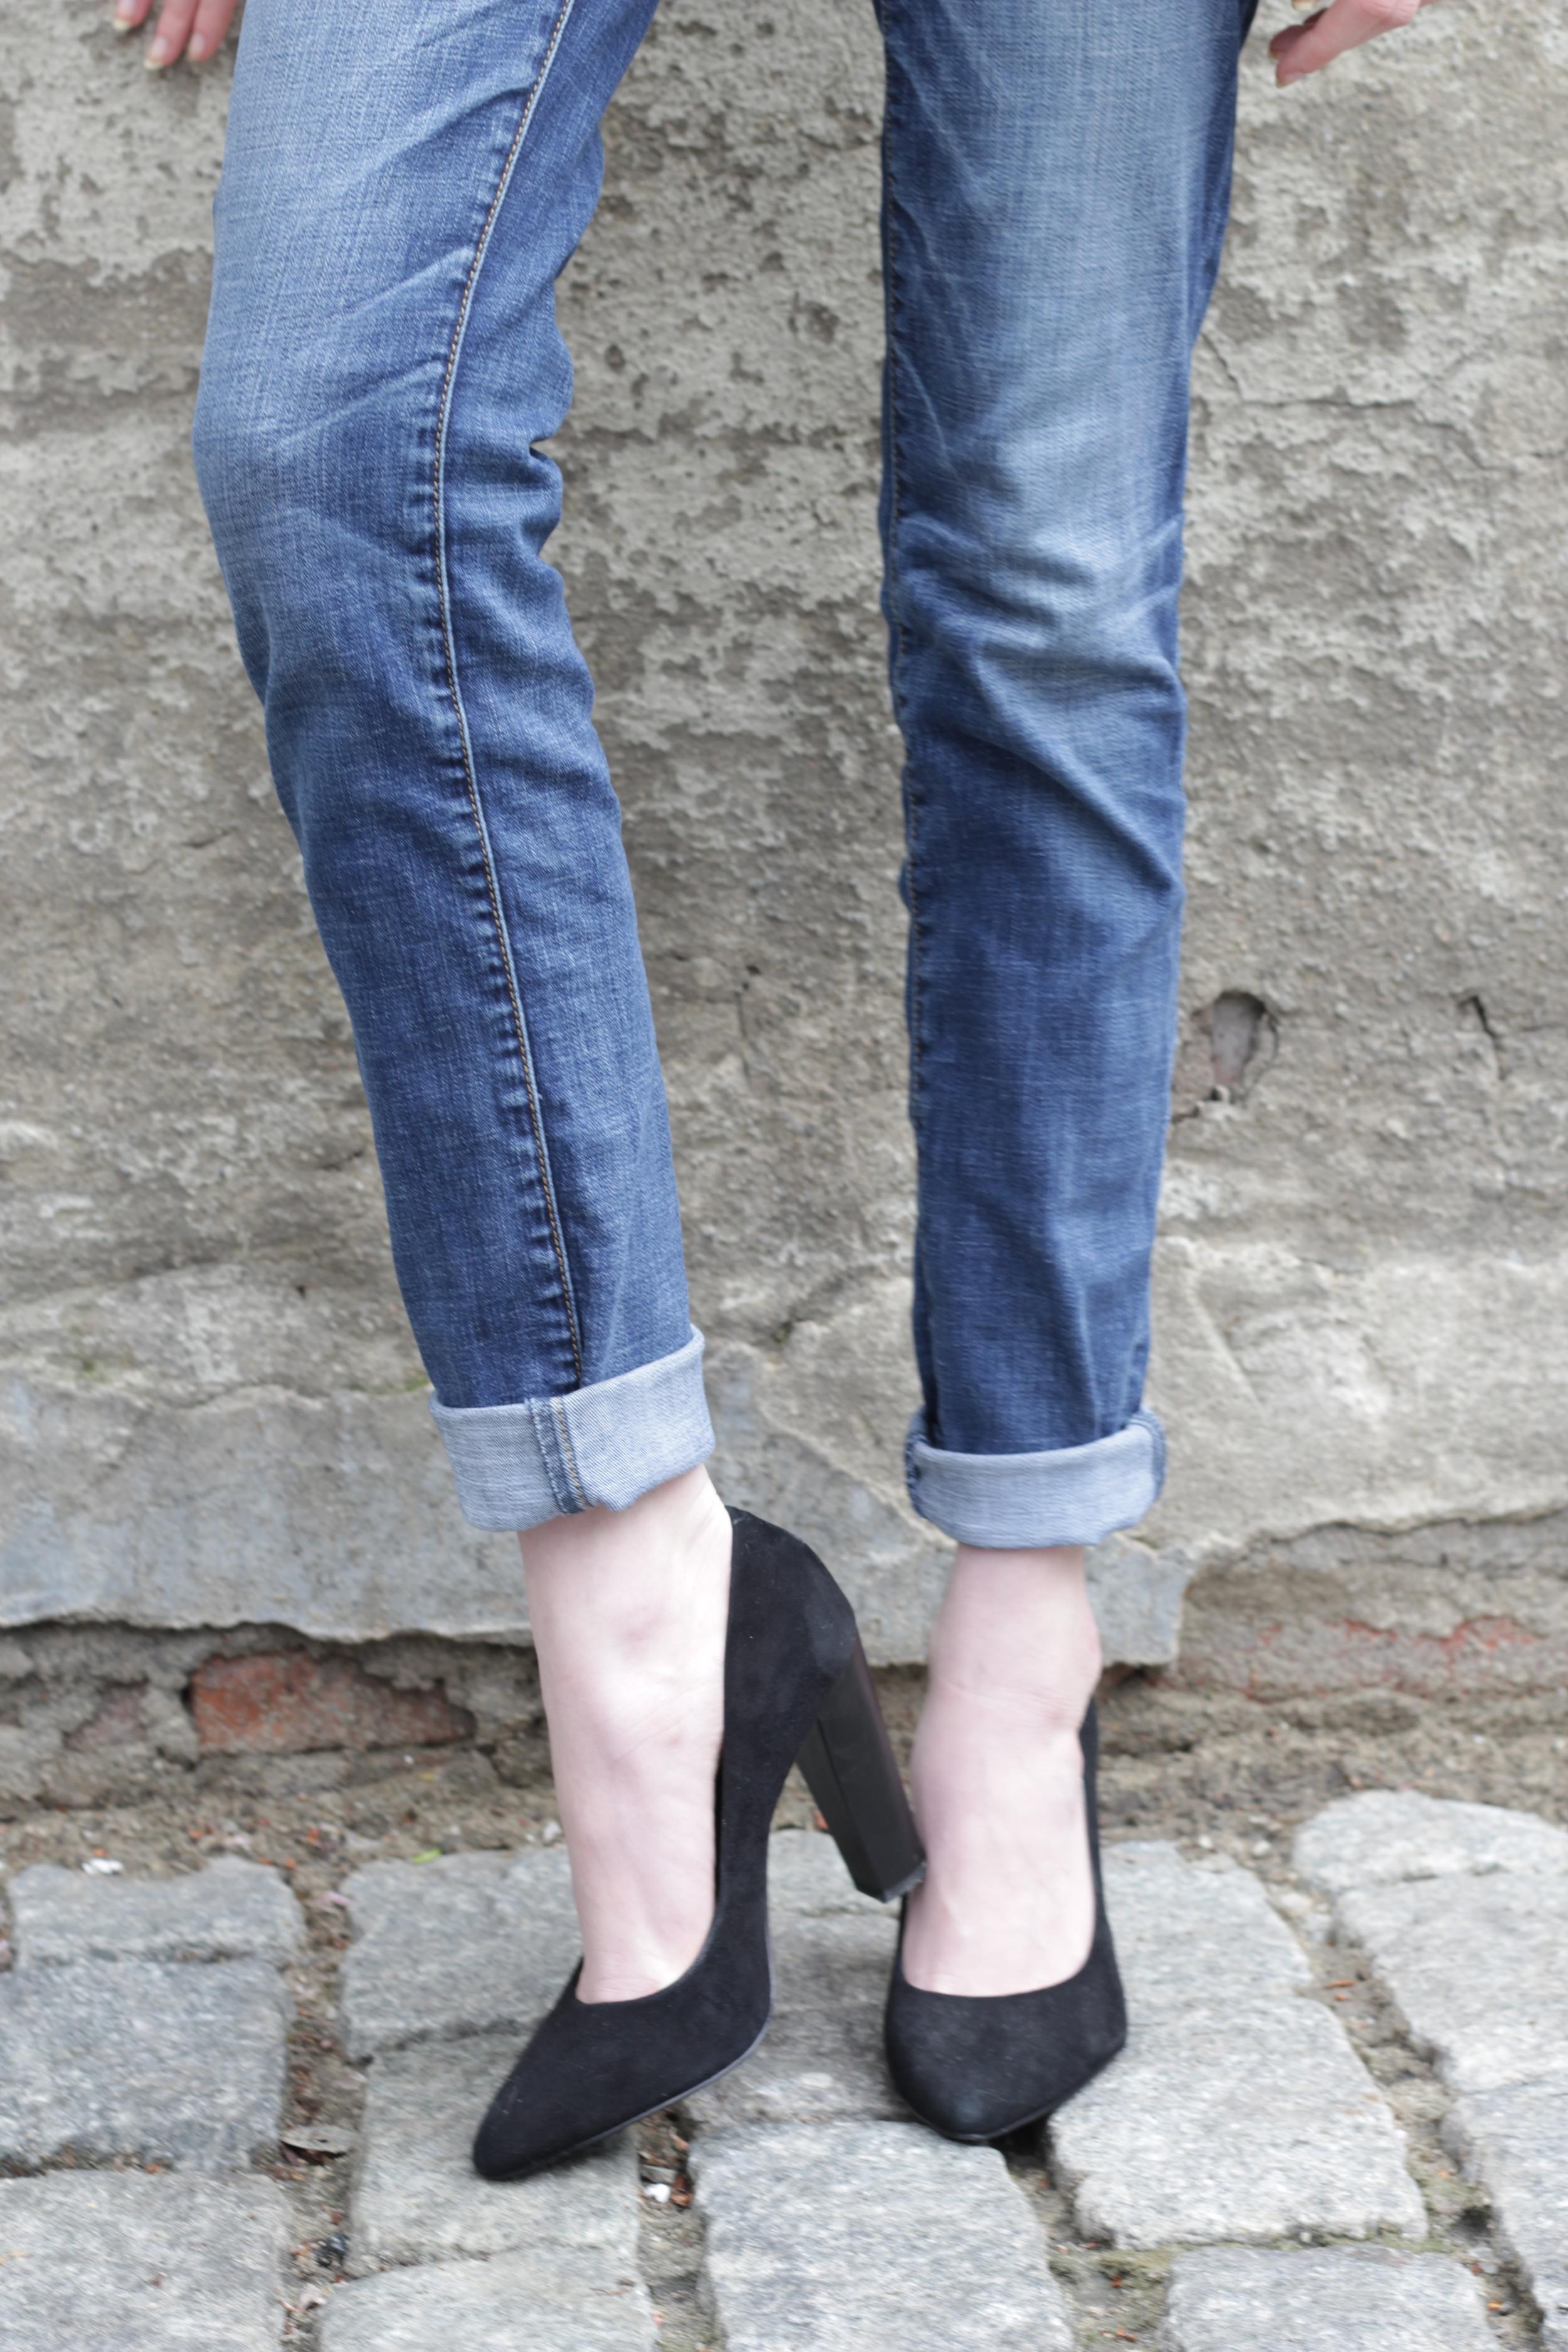 BCBG black pointed toe pumps, american eagle jeans